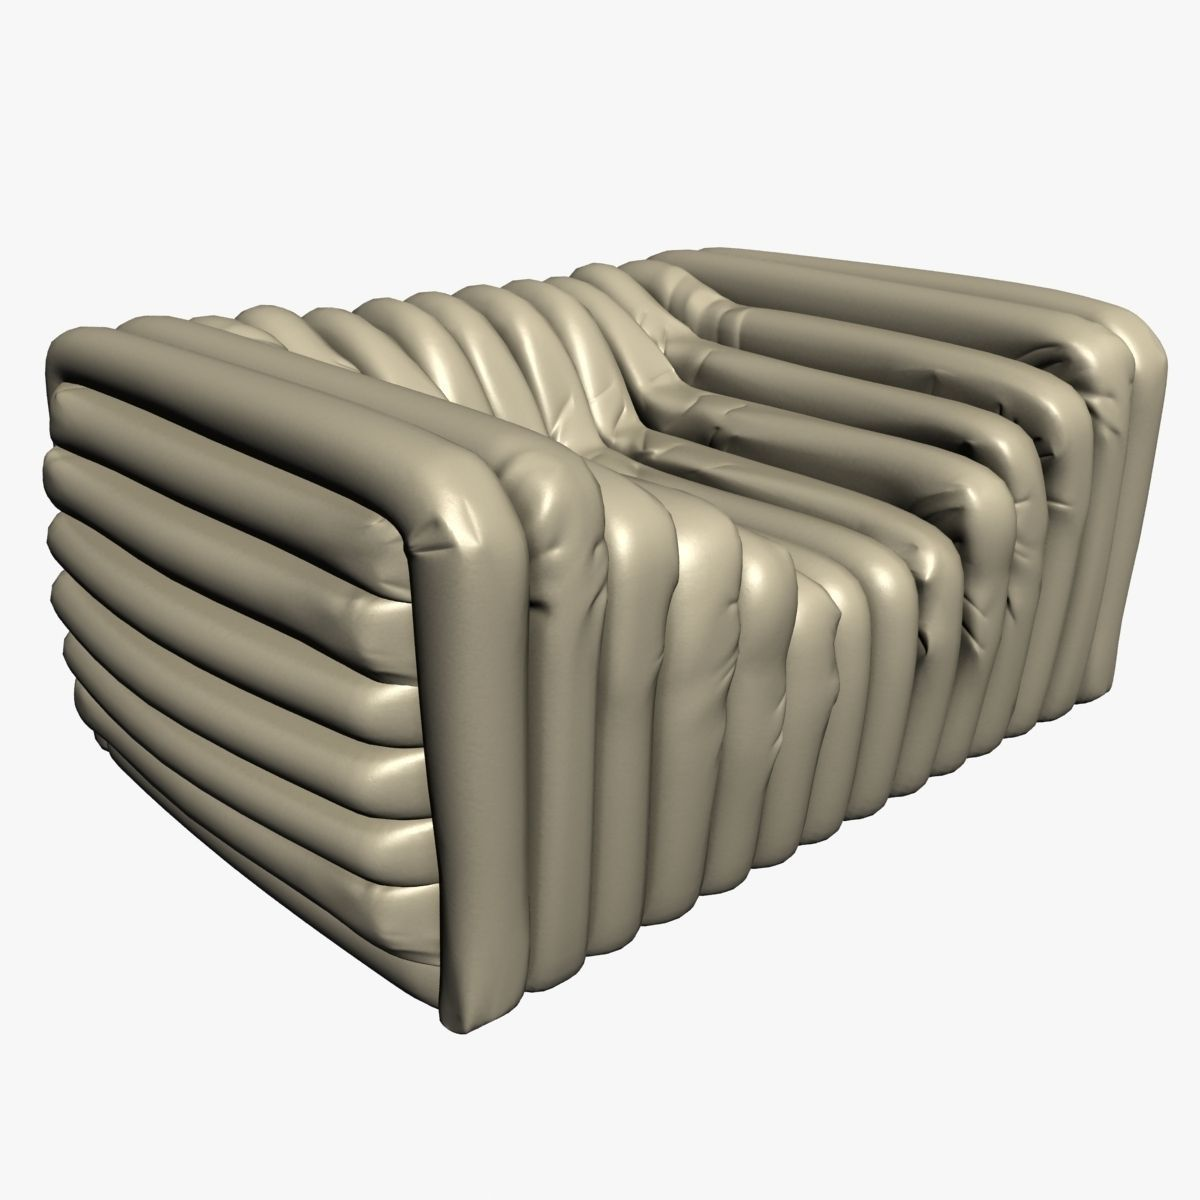 Merveilleux Versace Bubble Sofa 3D Model